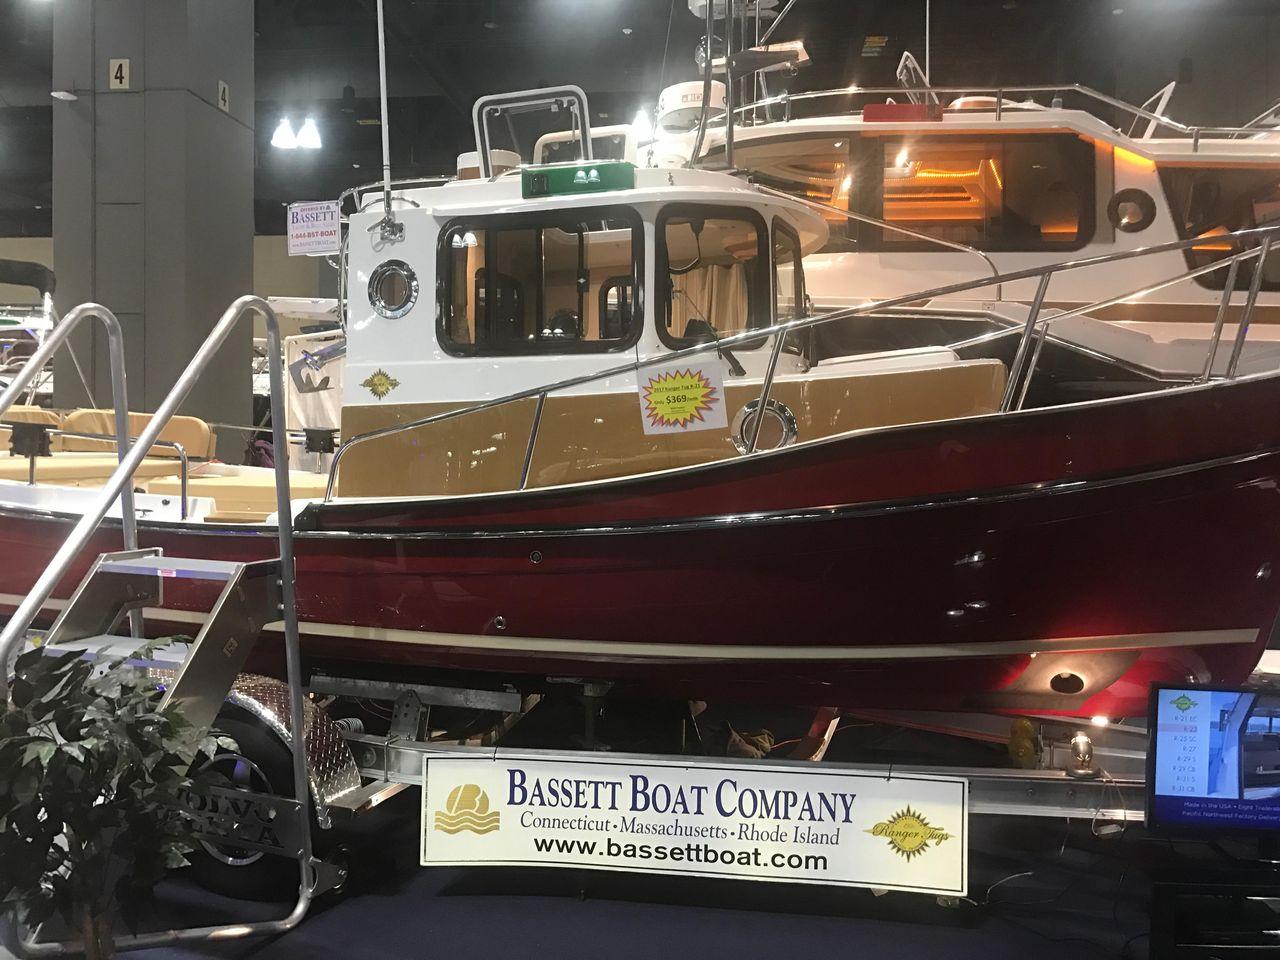 2017 Used Ranger Tugs 21 EC21 EC Downeast Fishing Boat For